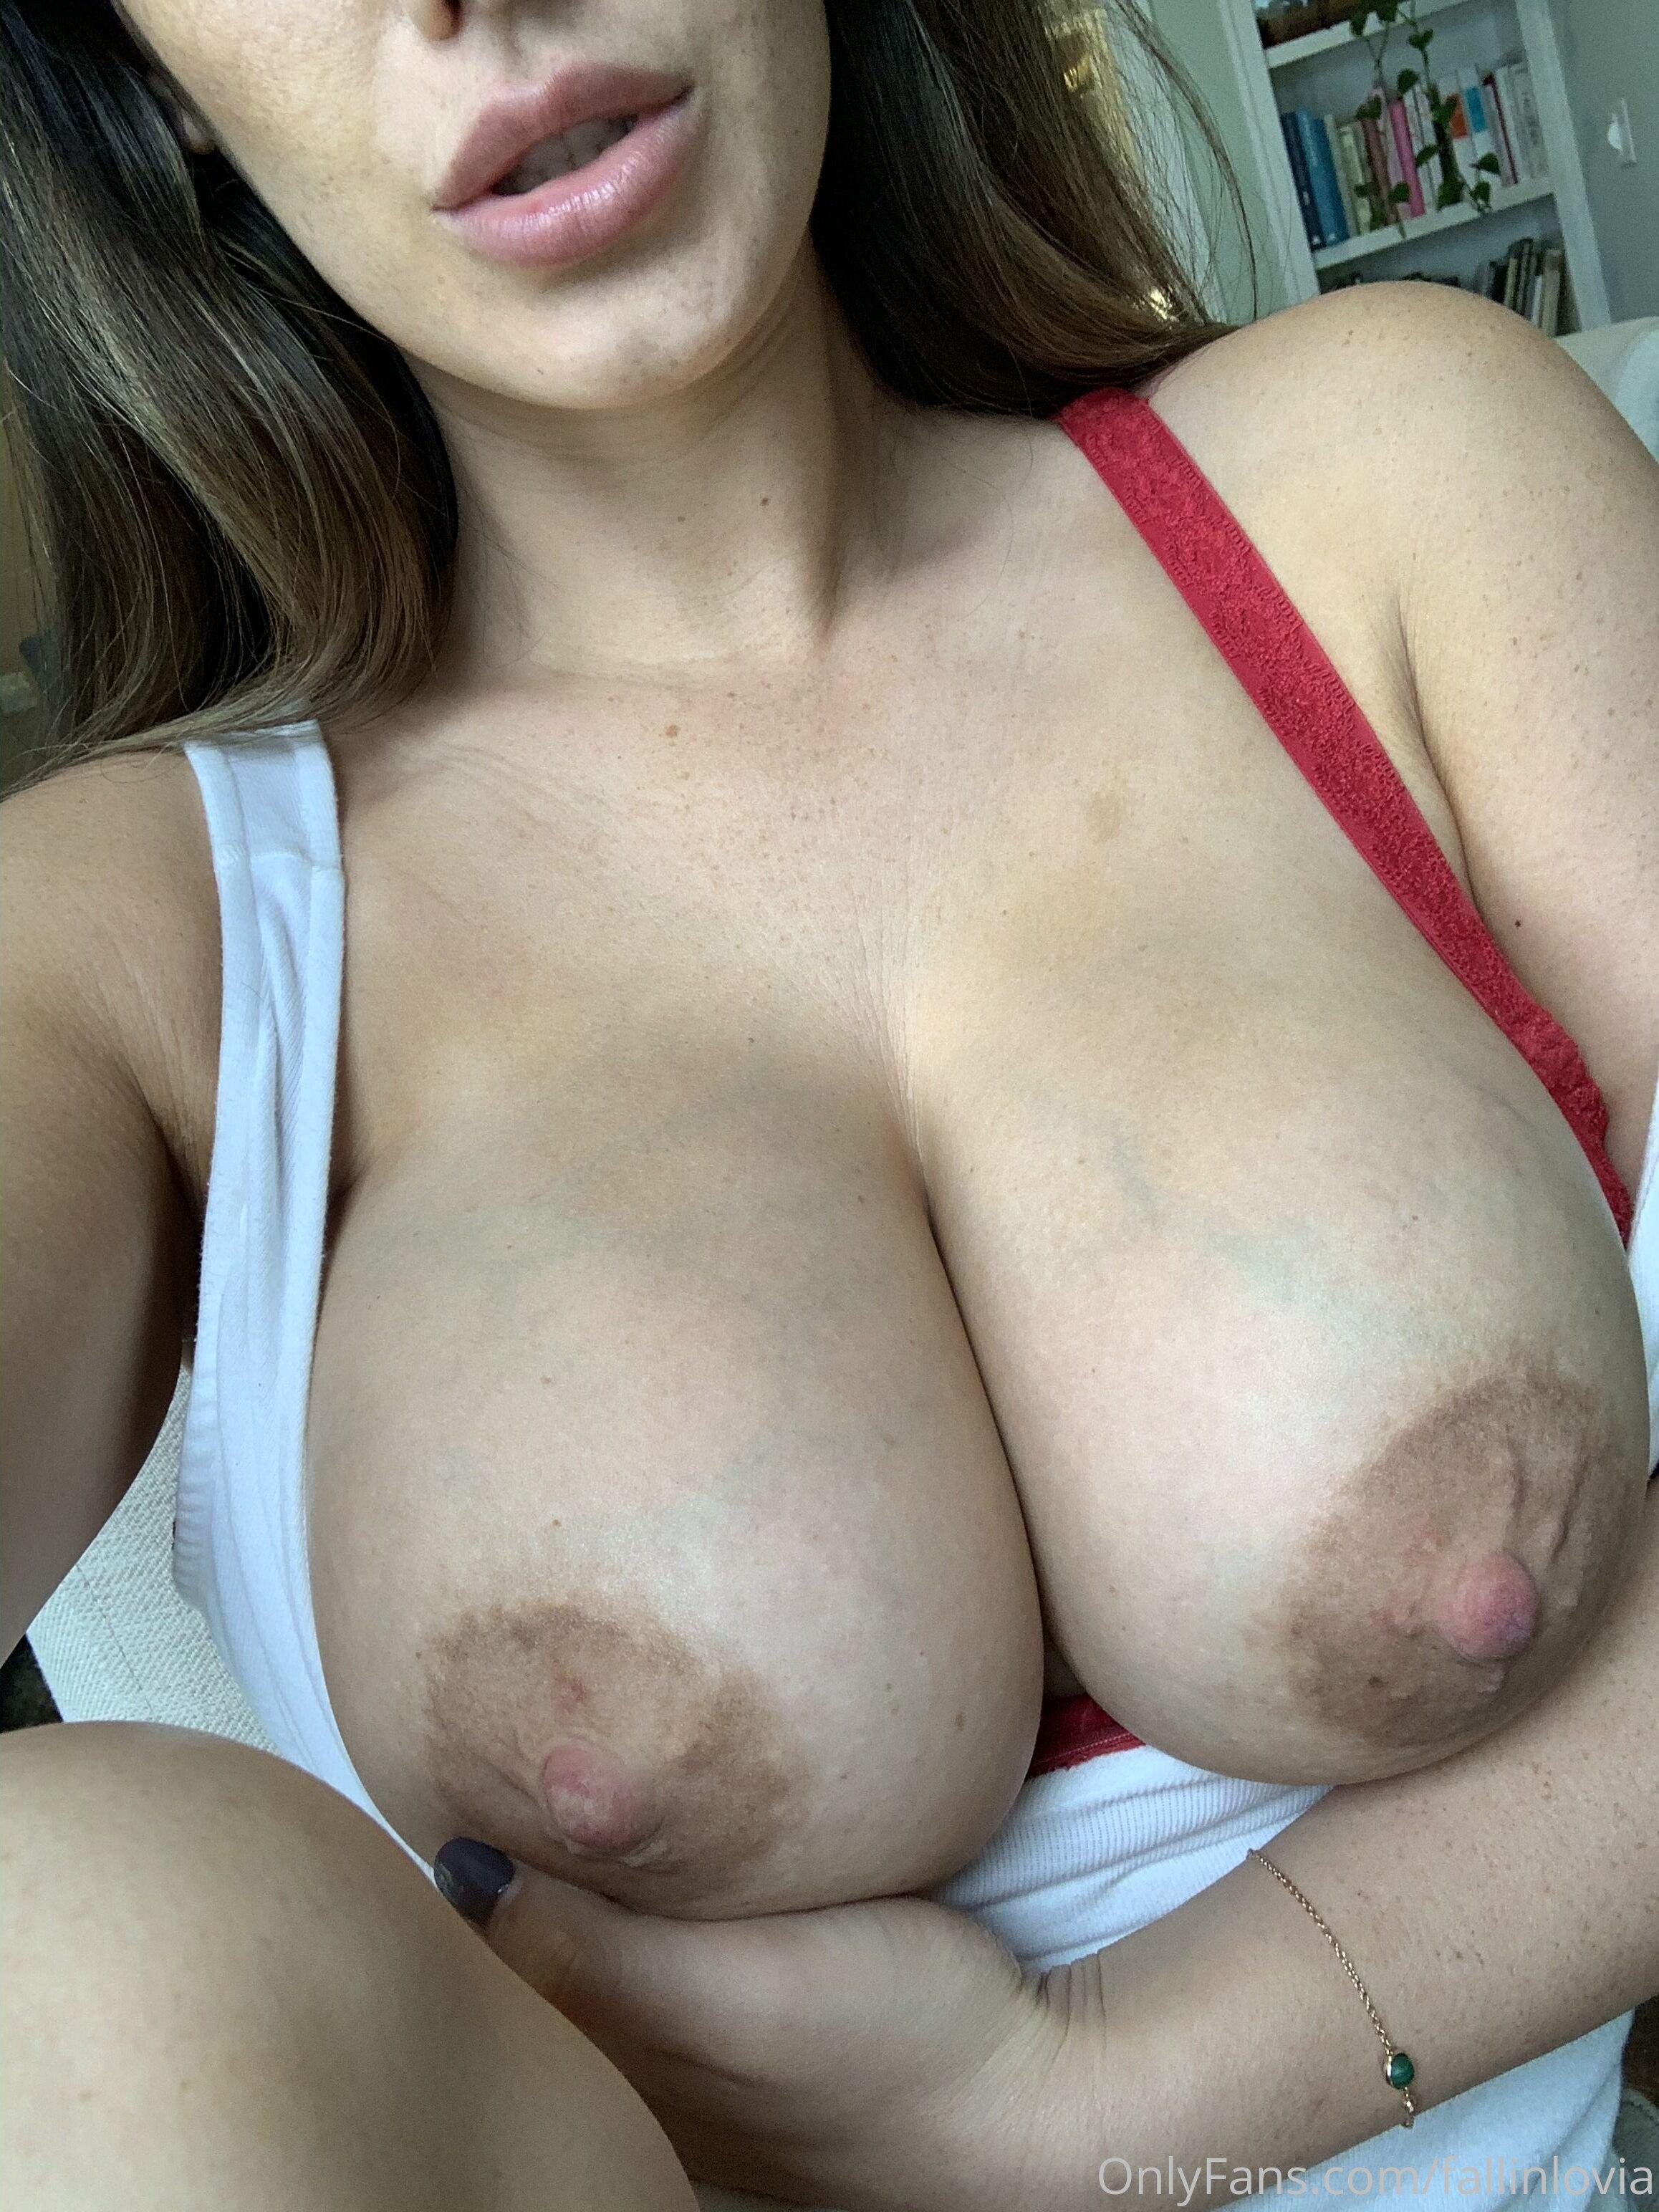 Eva Lovia, Fallinlovia, Onlyfans 0049